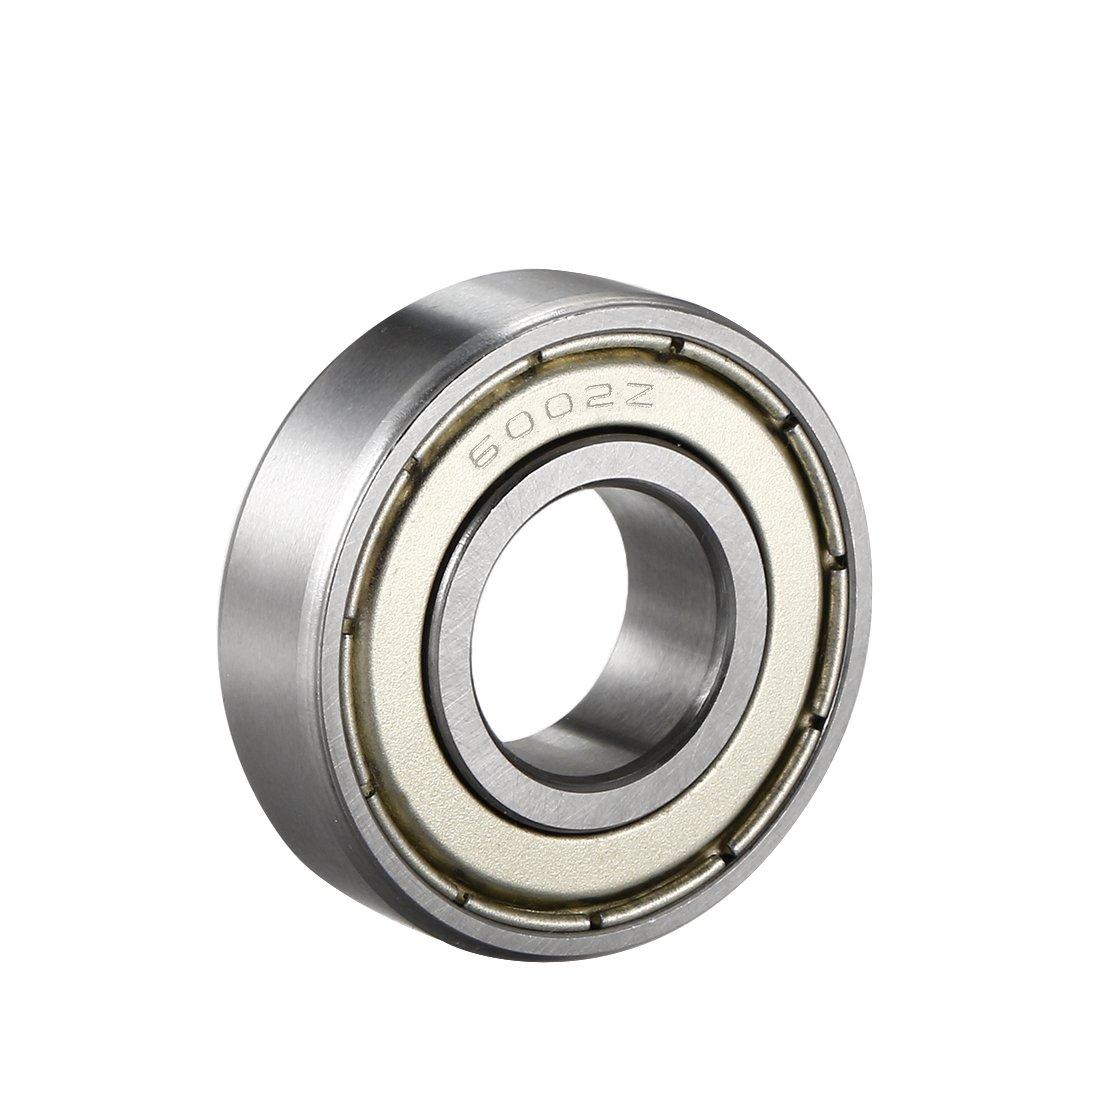 sourcingmap 6002Z Deep Groove Ball Bearing Single Shield 60102, 15mm x 32mm x 9mm Chrome Steel Bearings (Pack of 1) a18051100ux0038